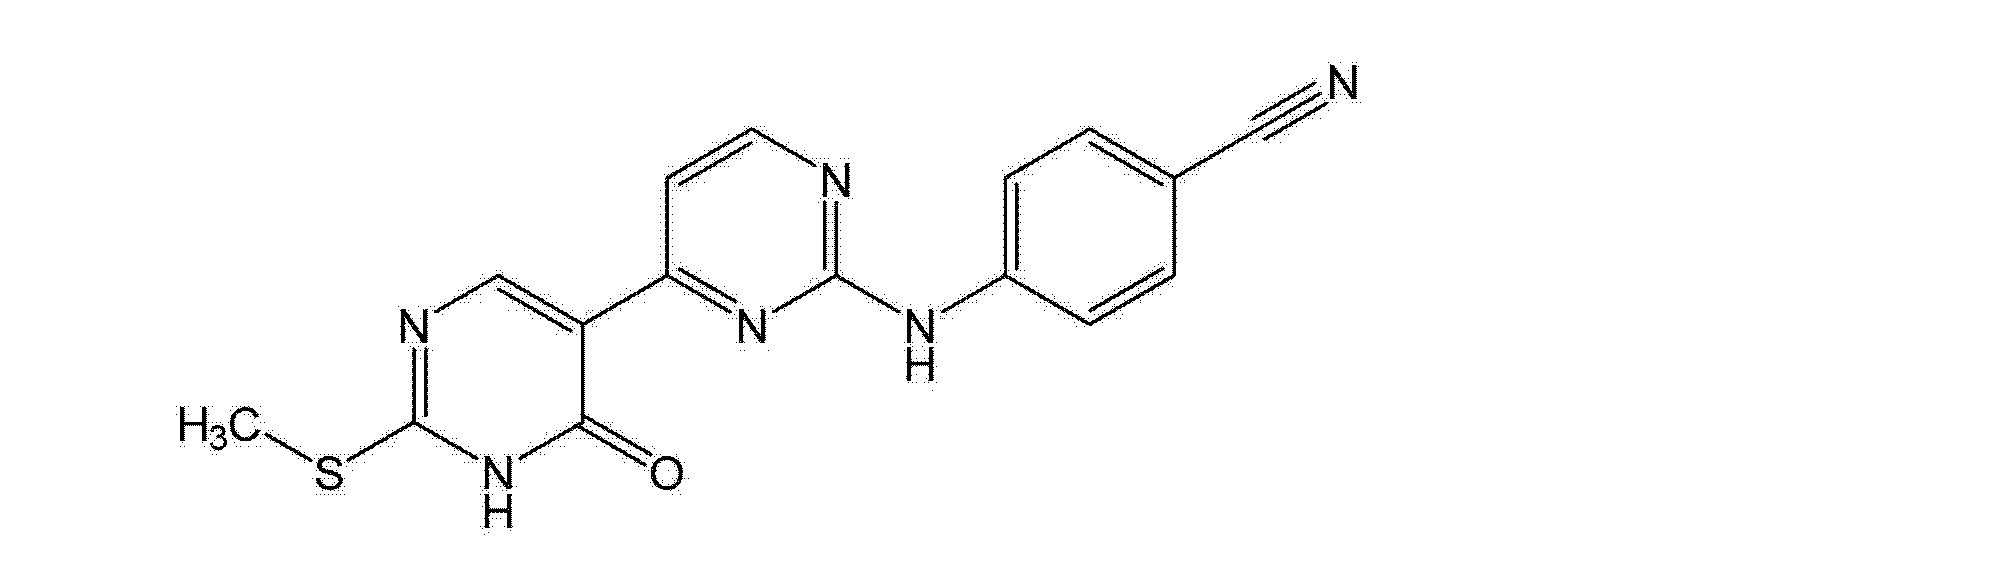 Figure CN103270026AD00801